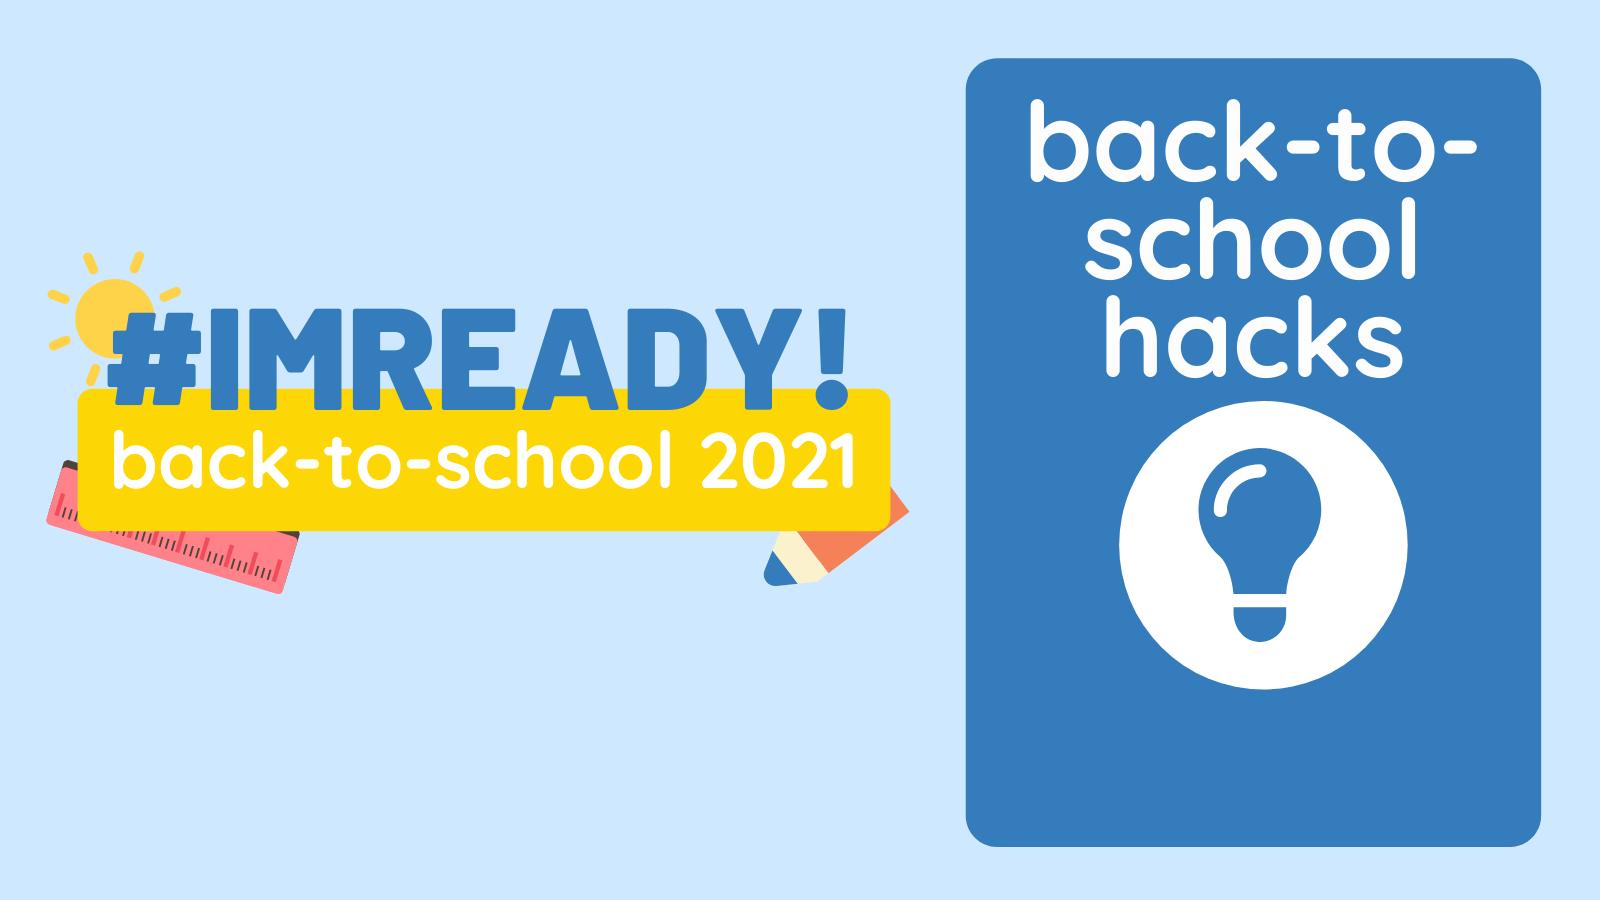 back-to-school hacks